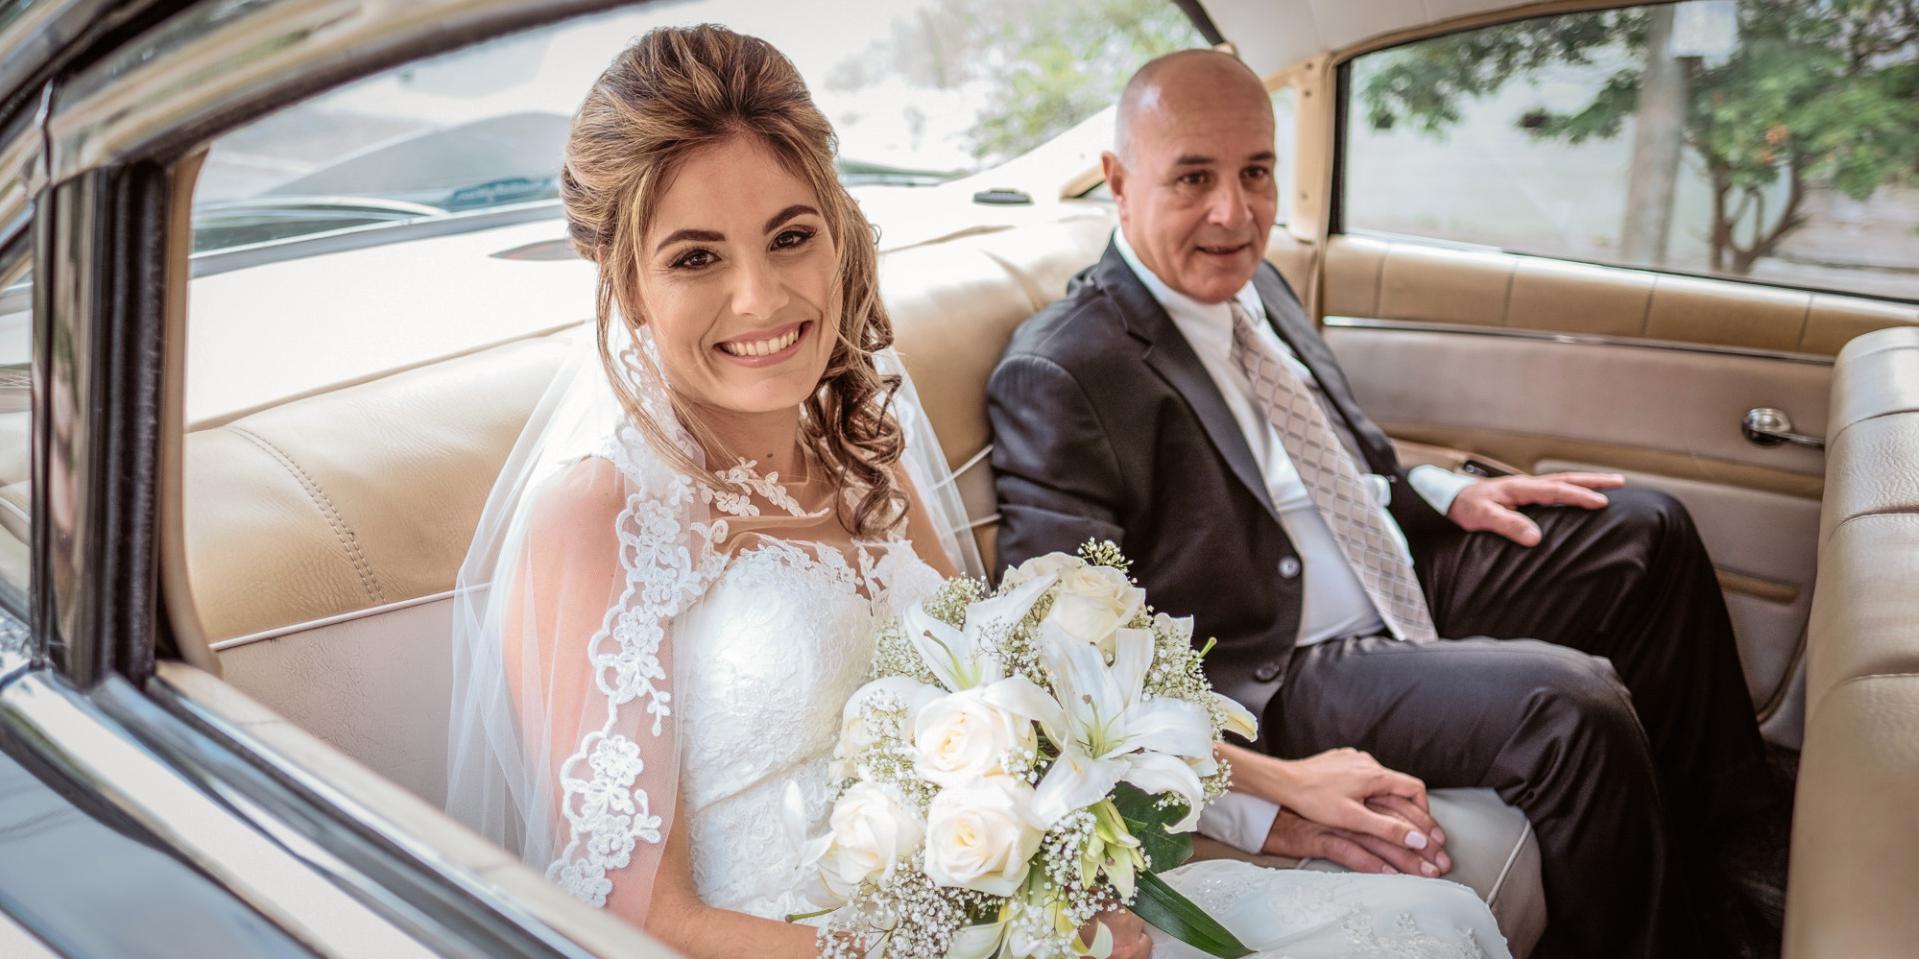 bodas-sin-clasificar-sin-tema-cuba-27551.jpg